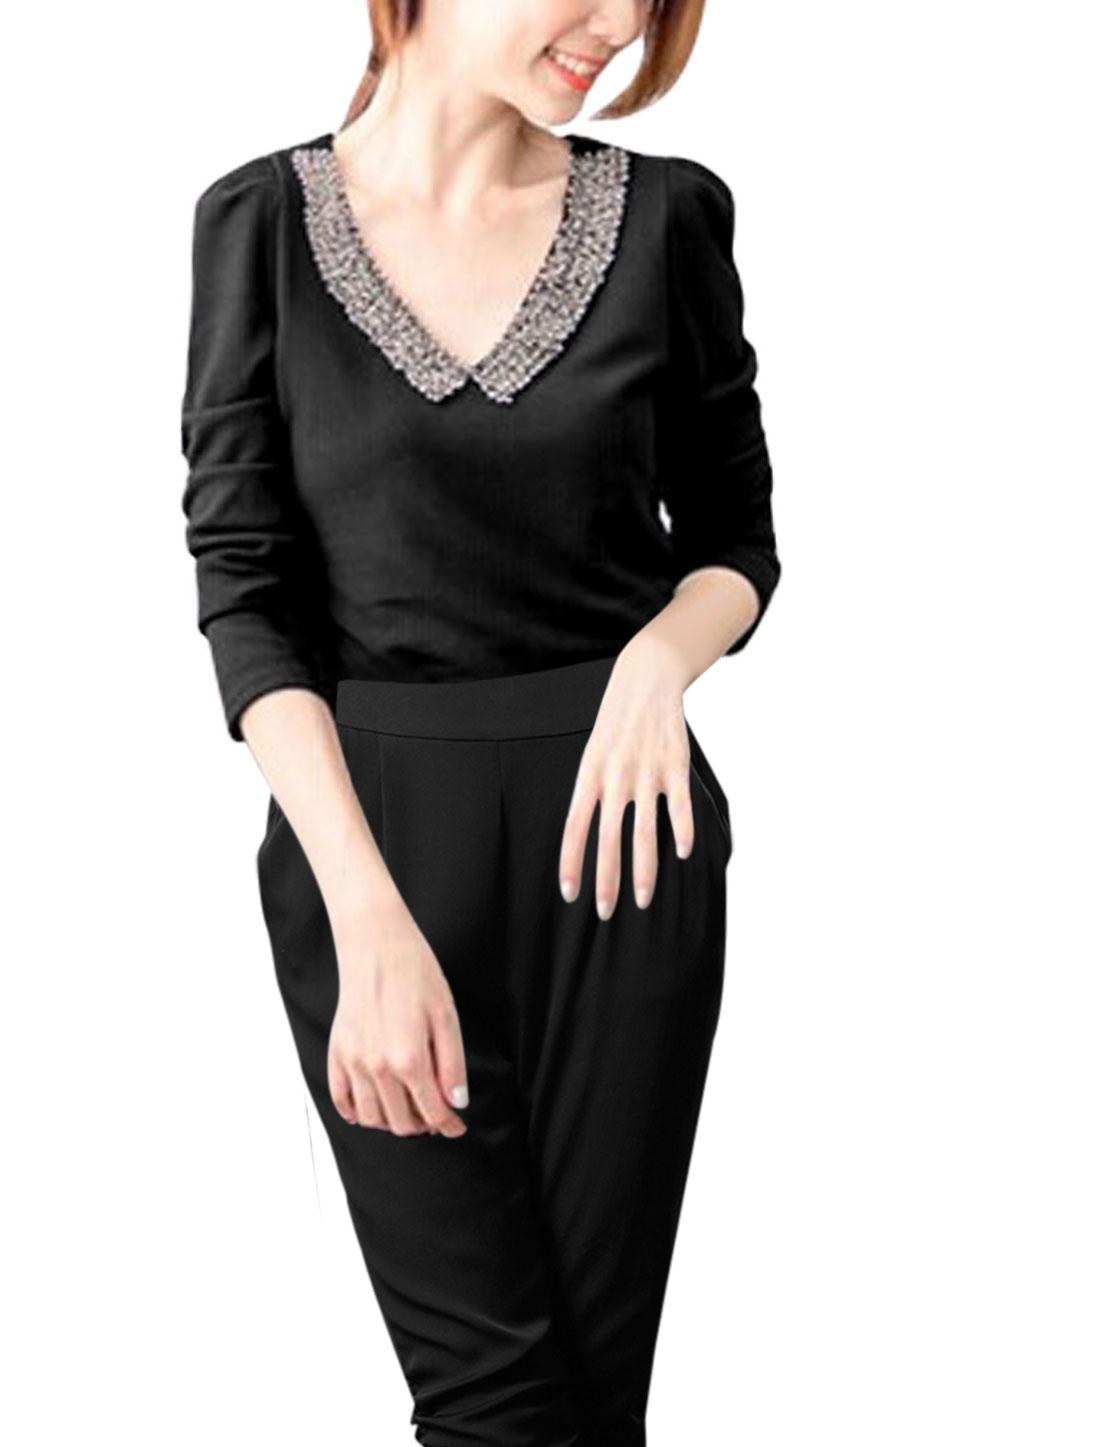 Women Beads Decor V Neck Long Sleeves Tunic Shirt Black S